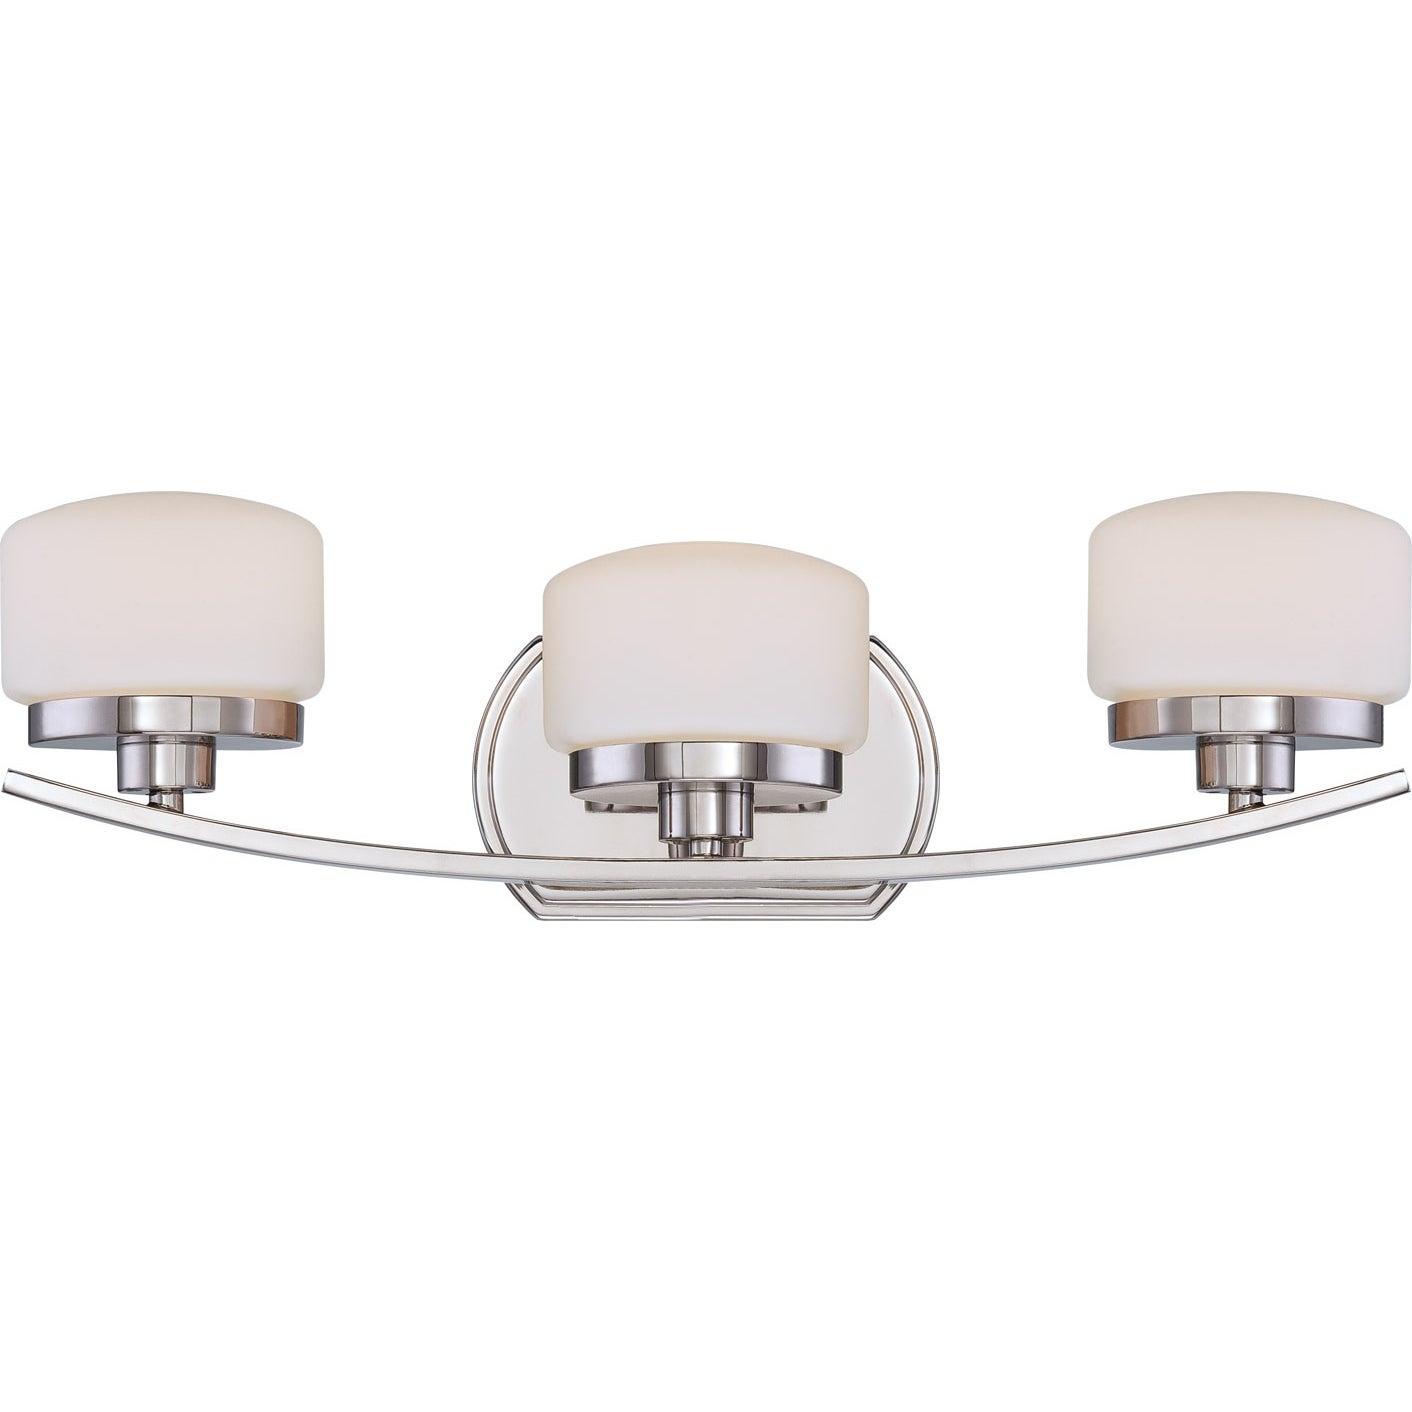 Nuvo 'Austin' 3-light Polished Nickel Vanity Fixture